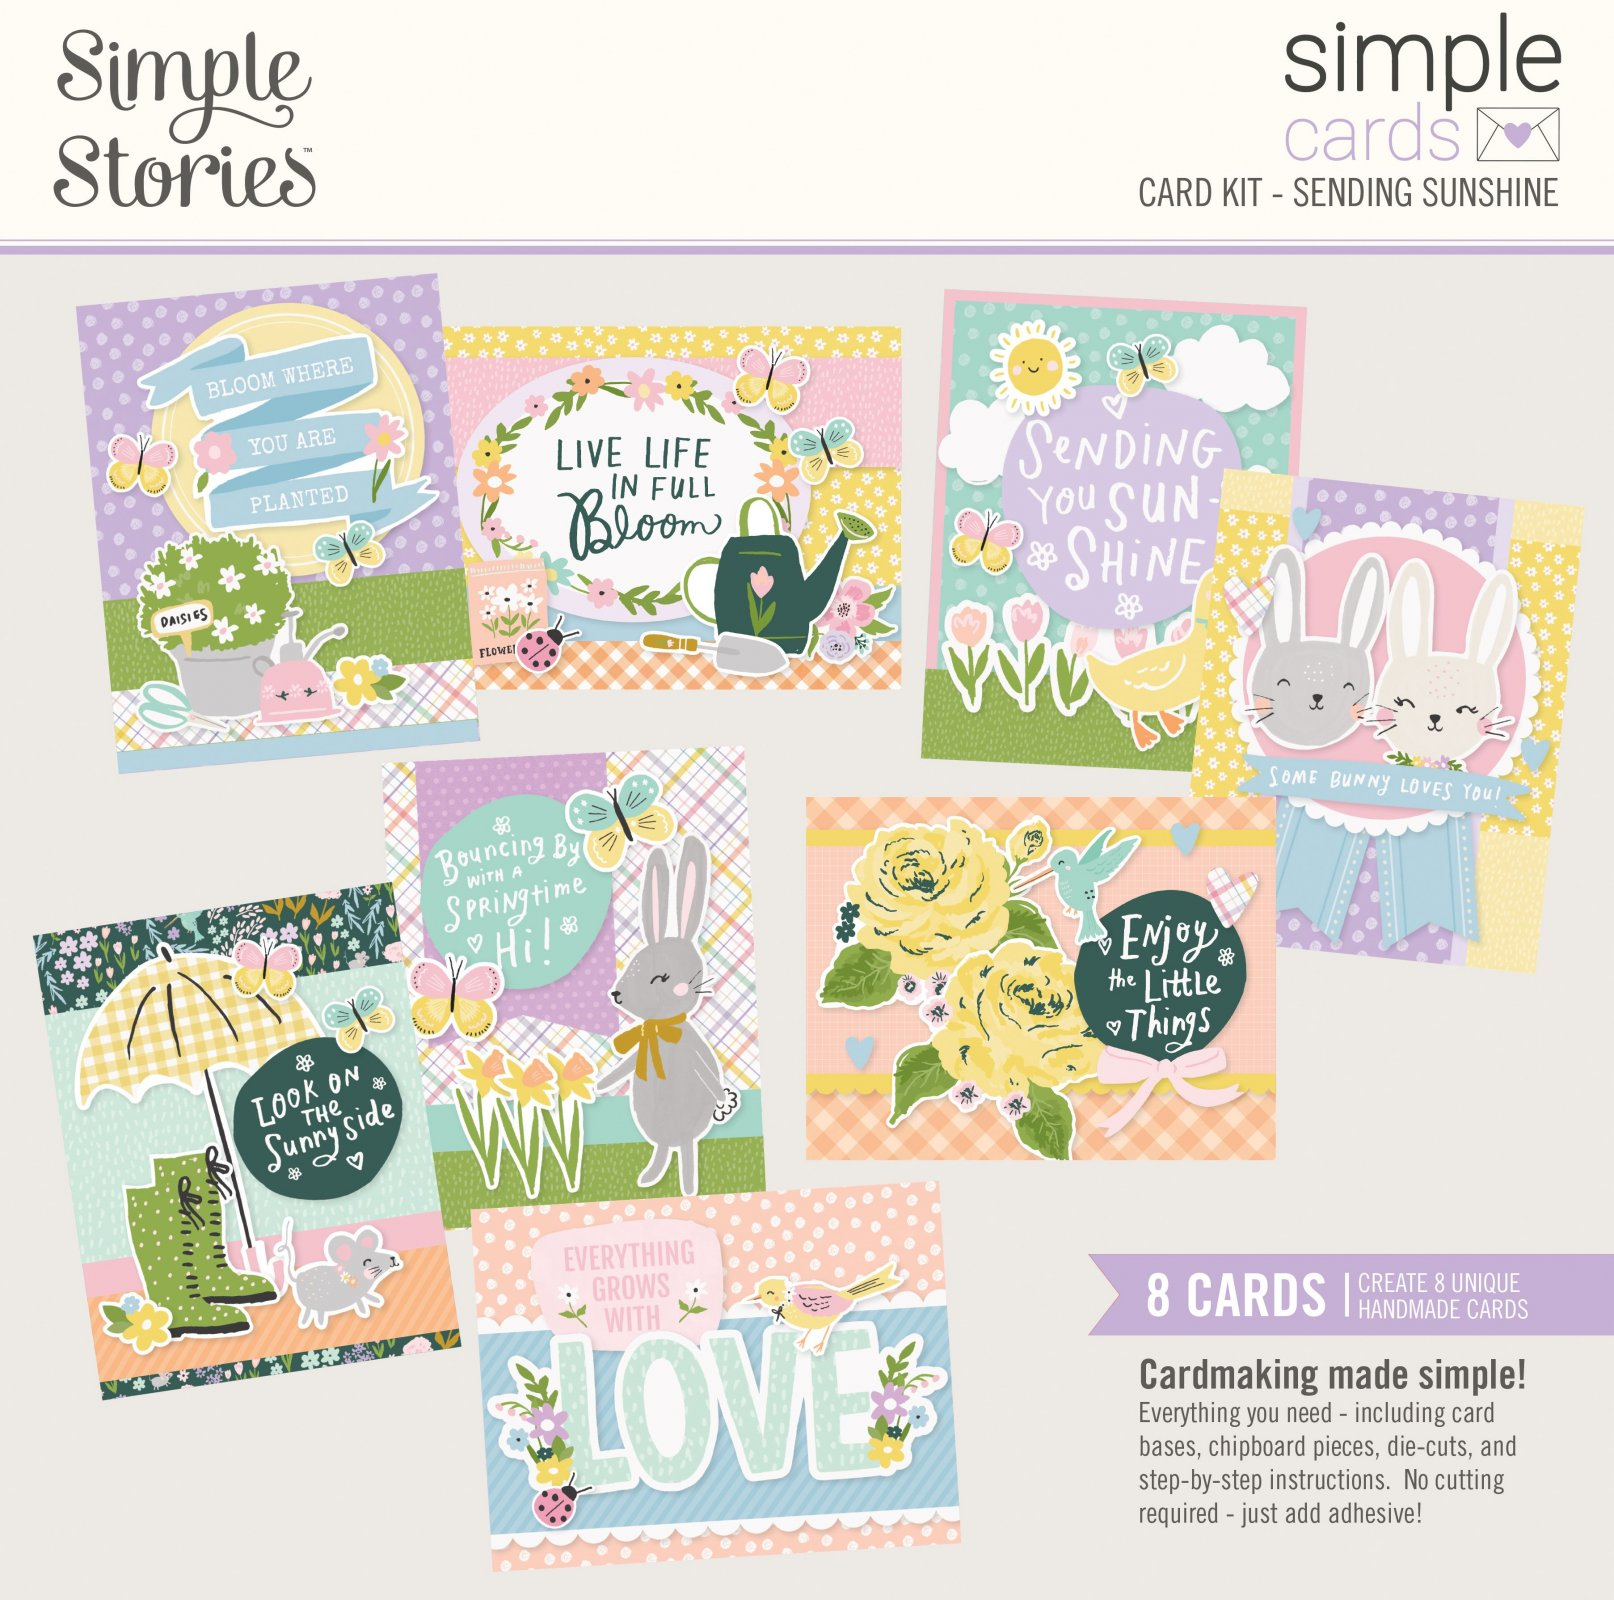 Simple Stories Simple Cards Card Kit - Sending Sunshine